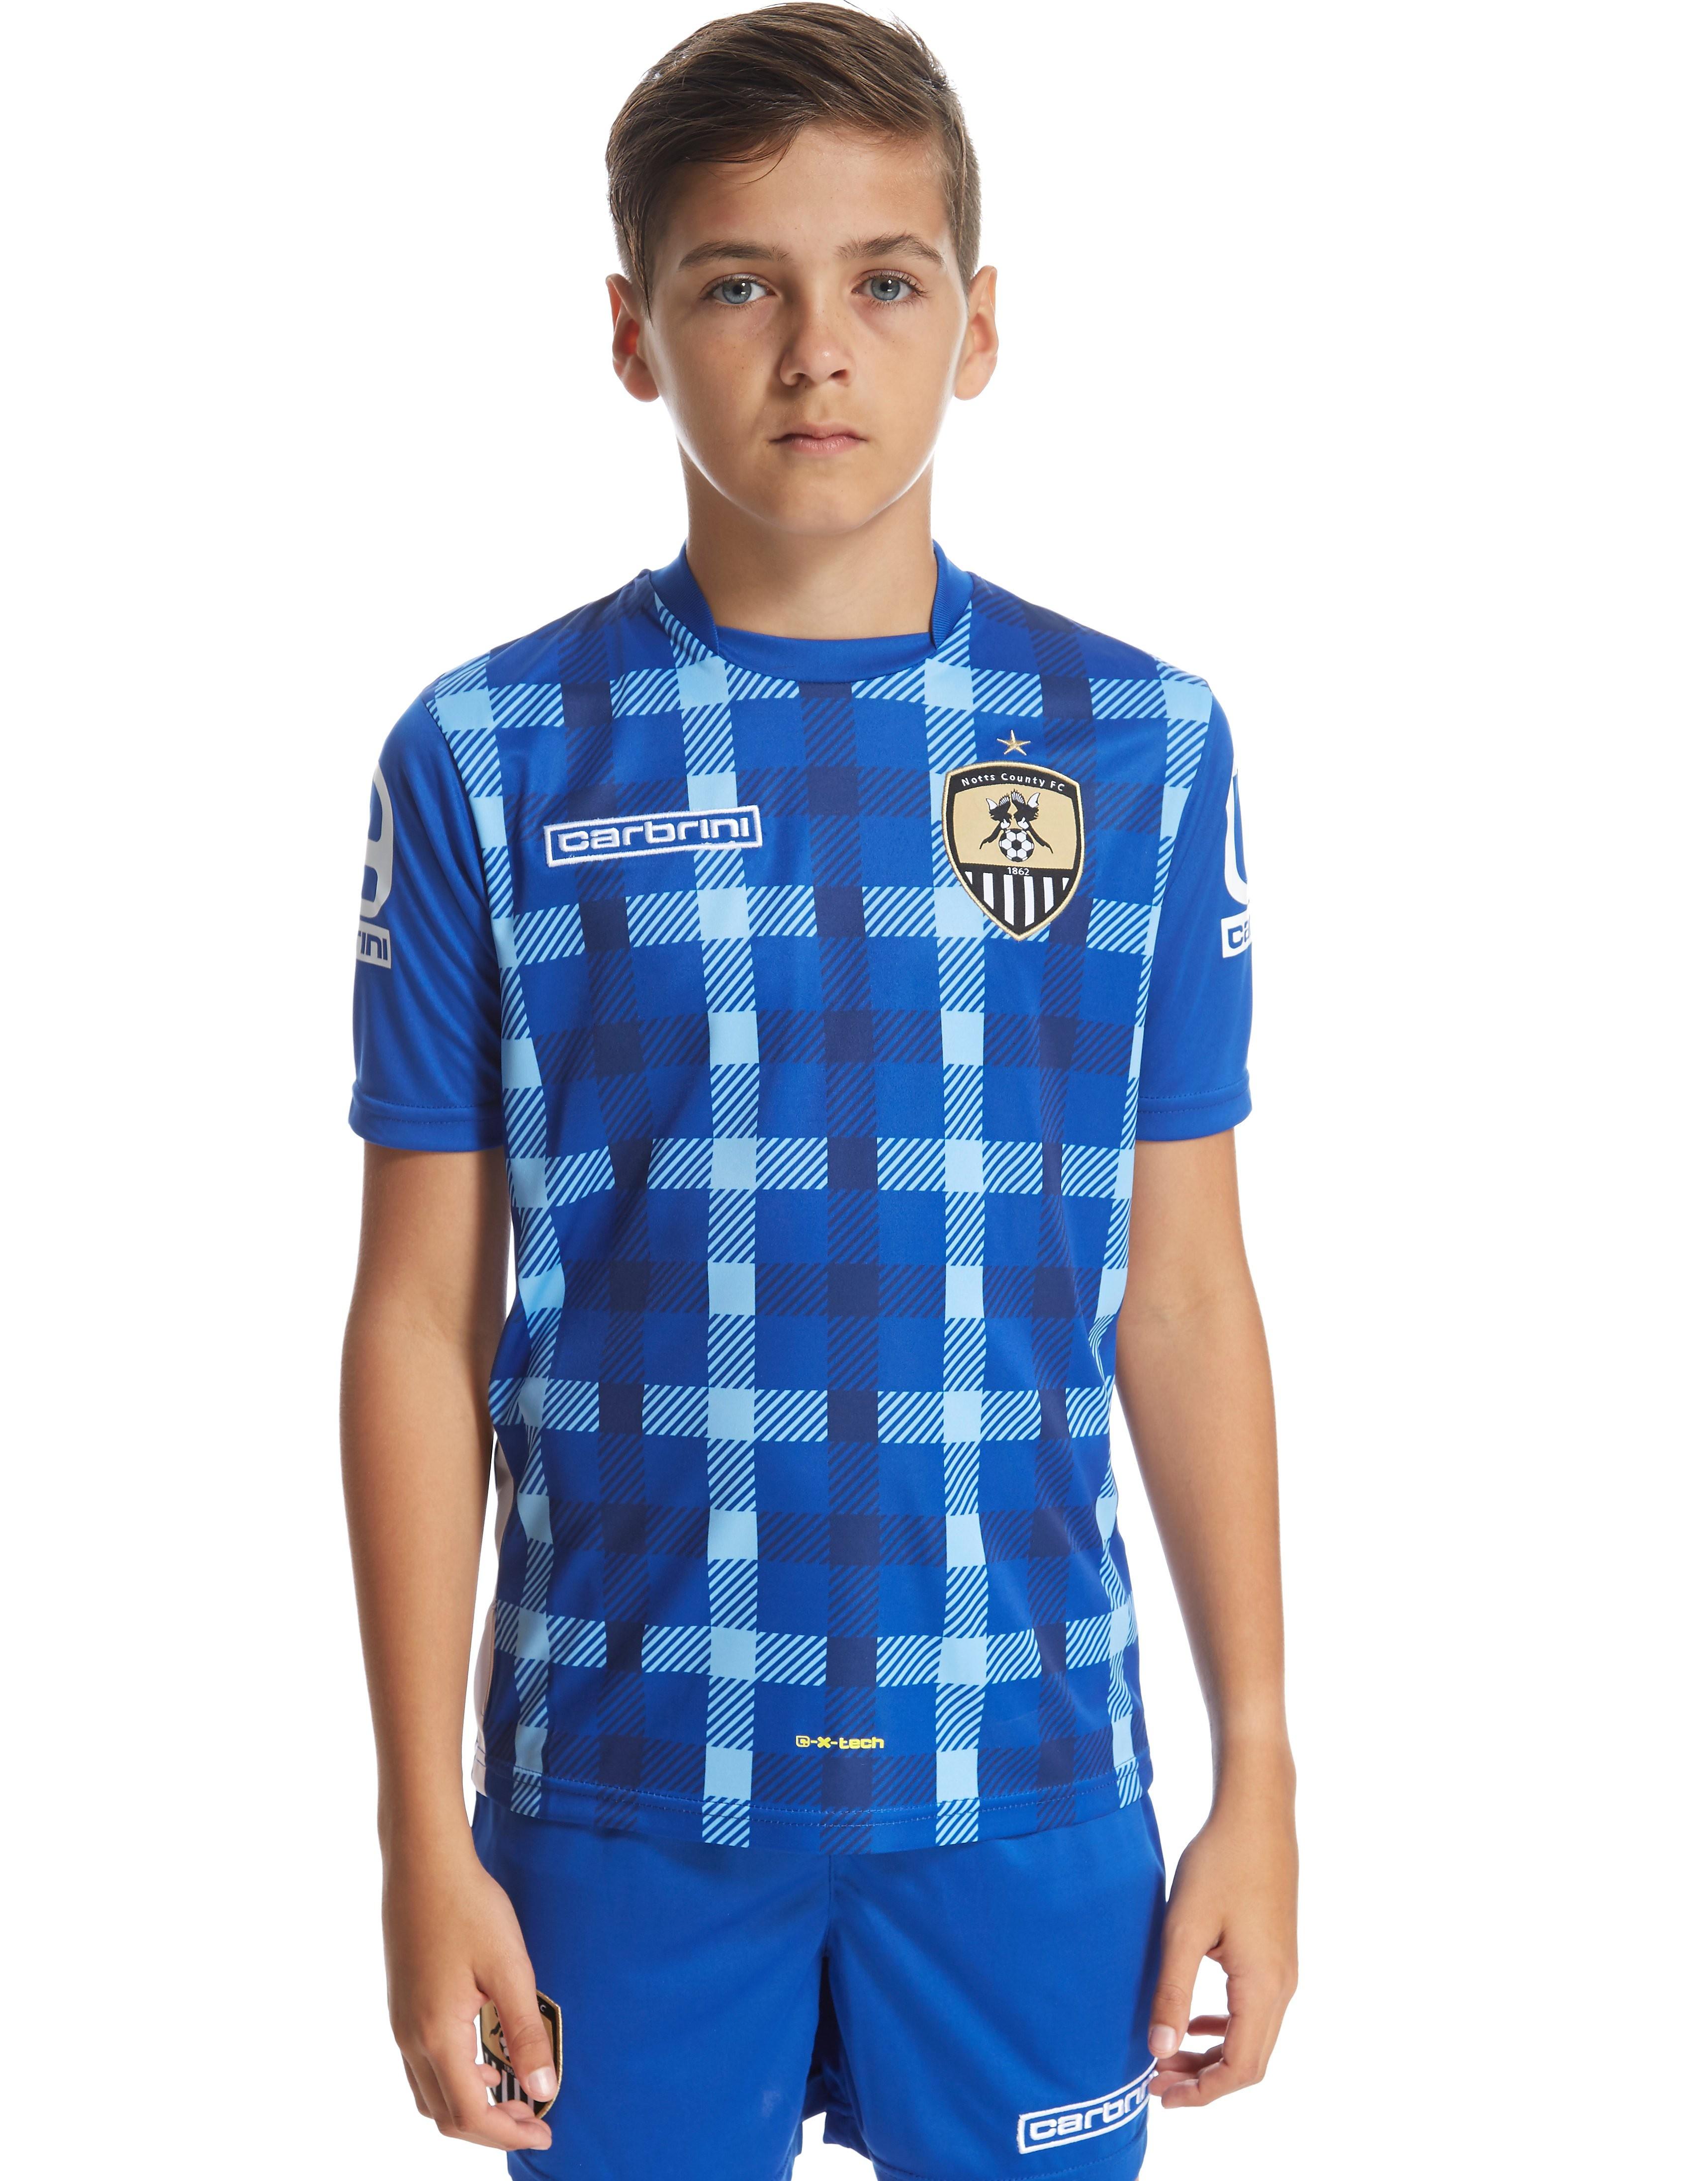 Carbrini Notts County FC Third 2015/16 Shirt Junior